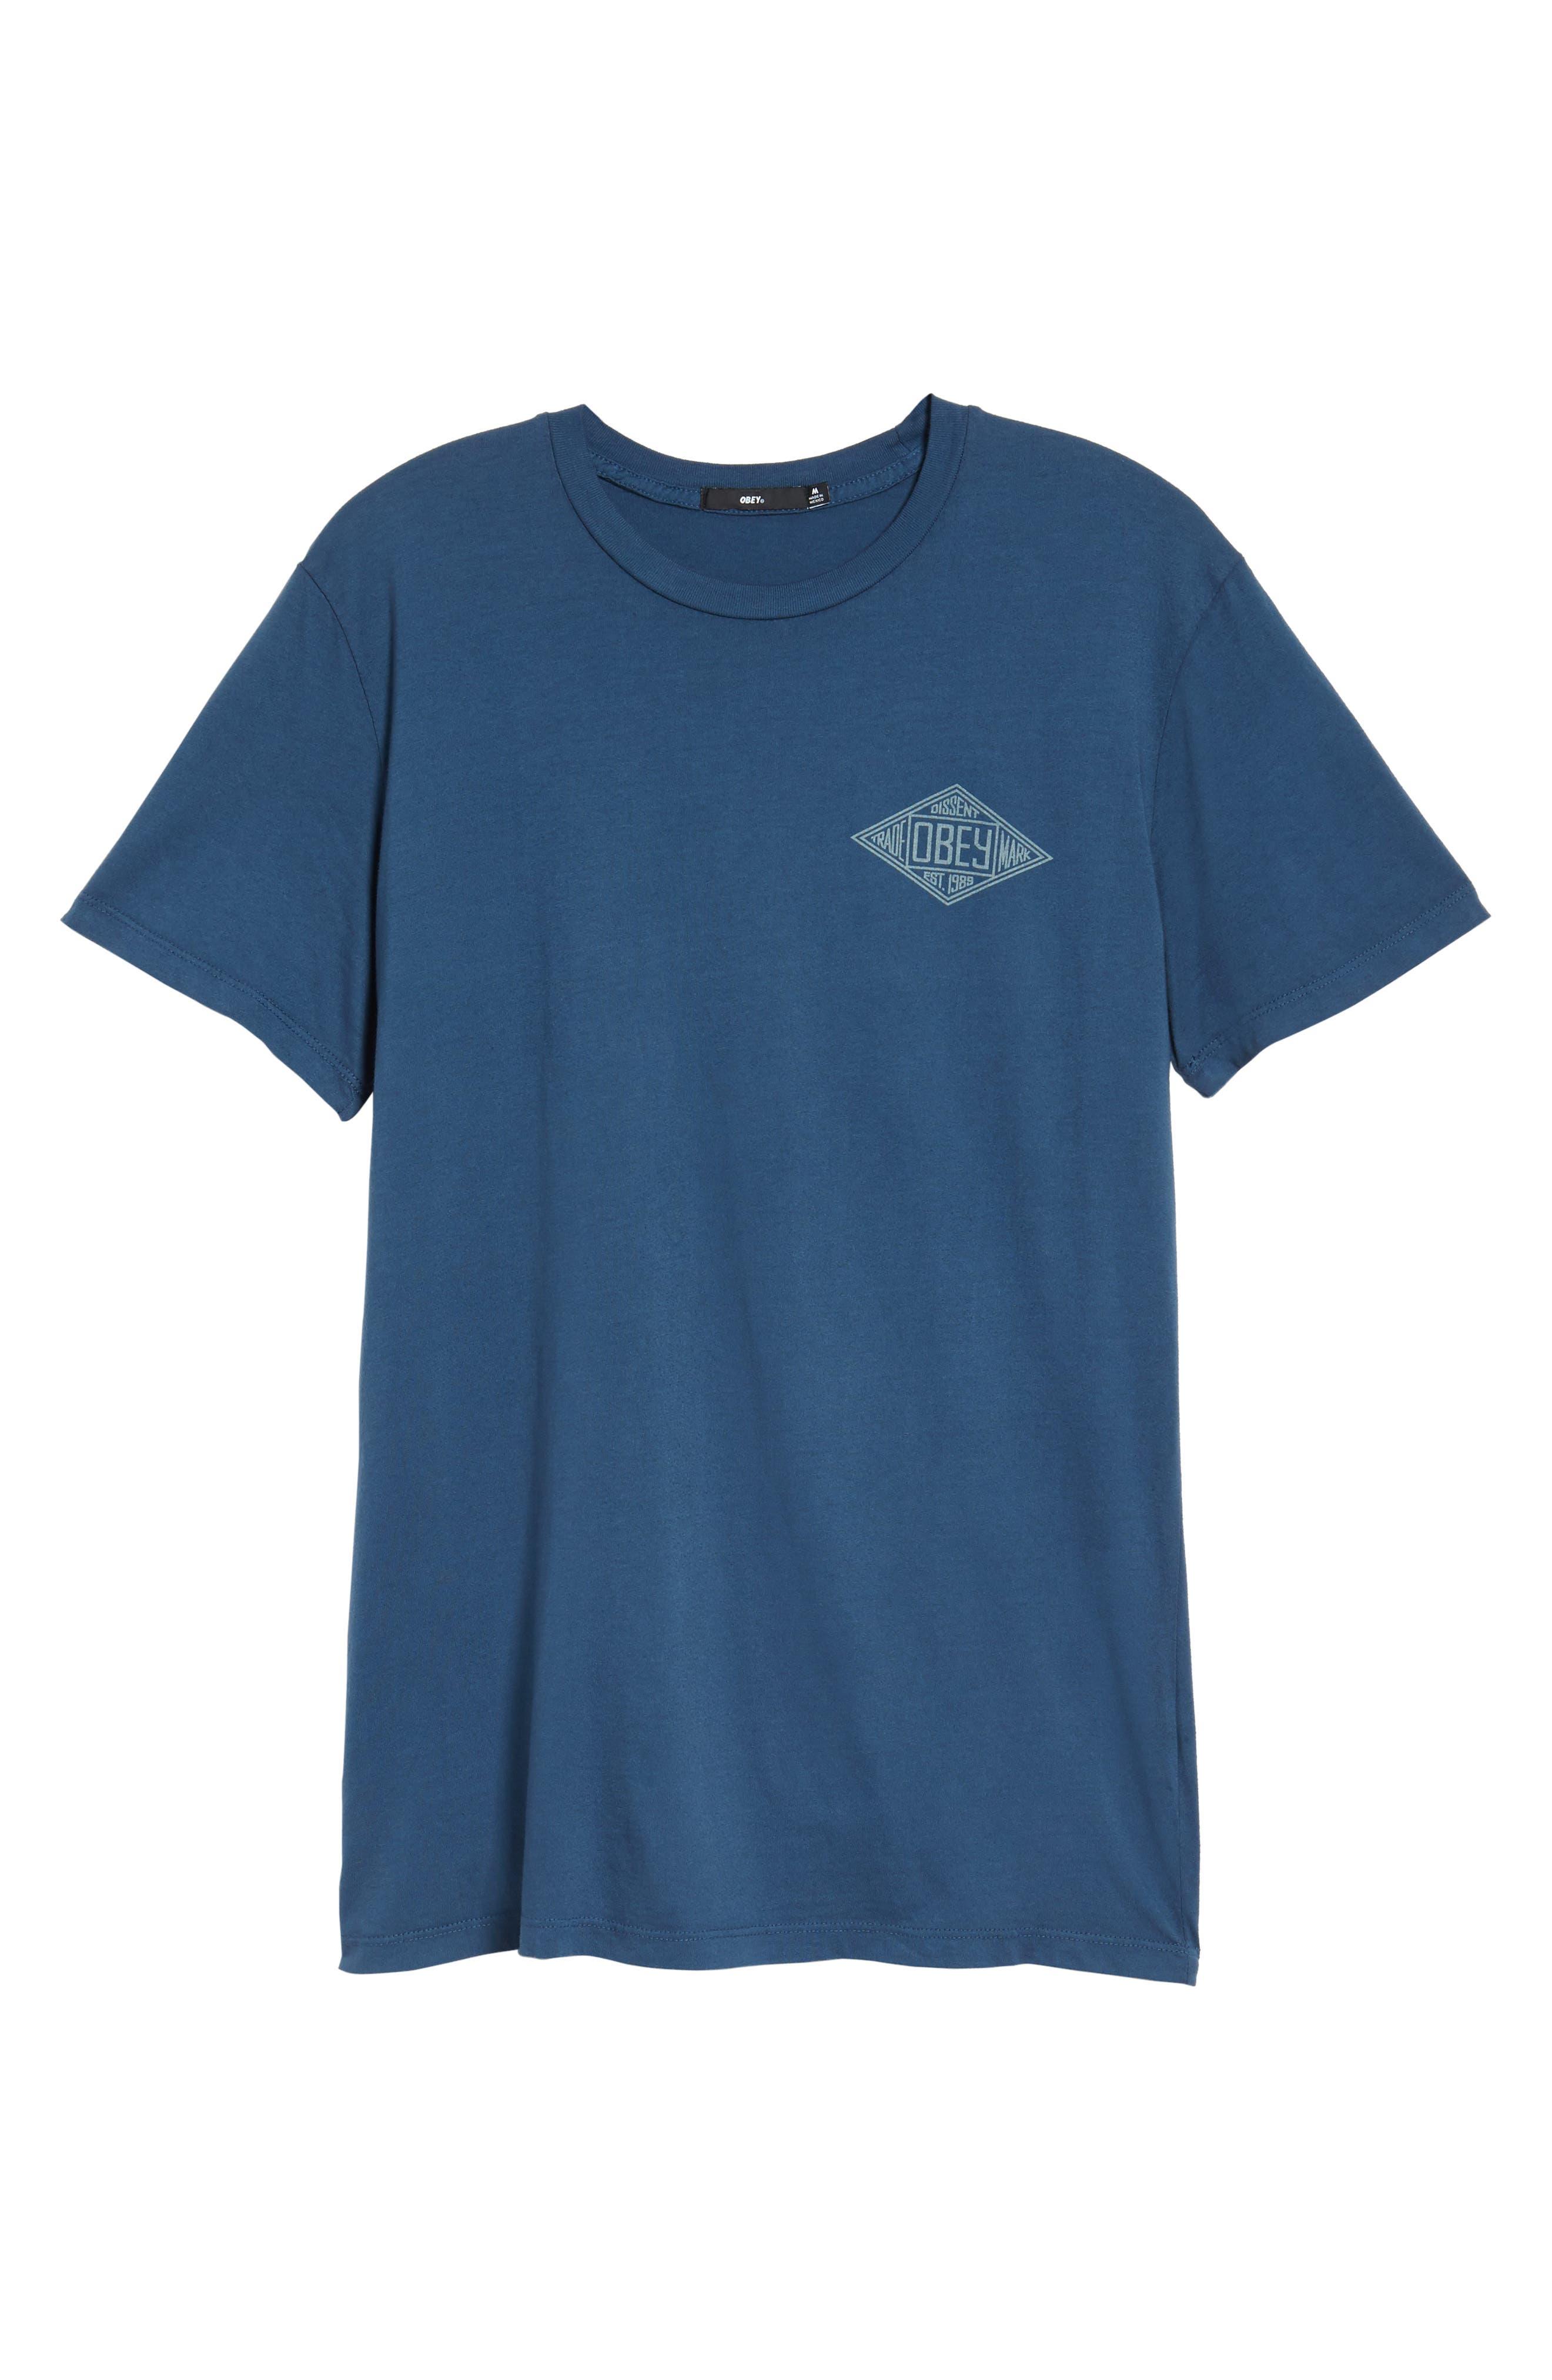 Trademark Diamond T-Shirt,                             Alternate thumbnail 6, color,                             424